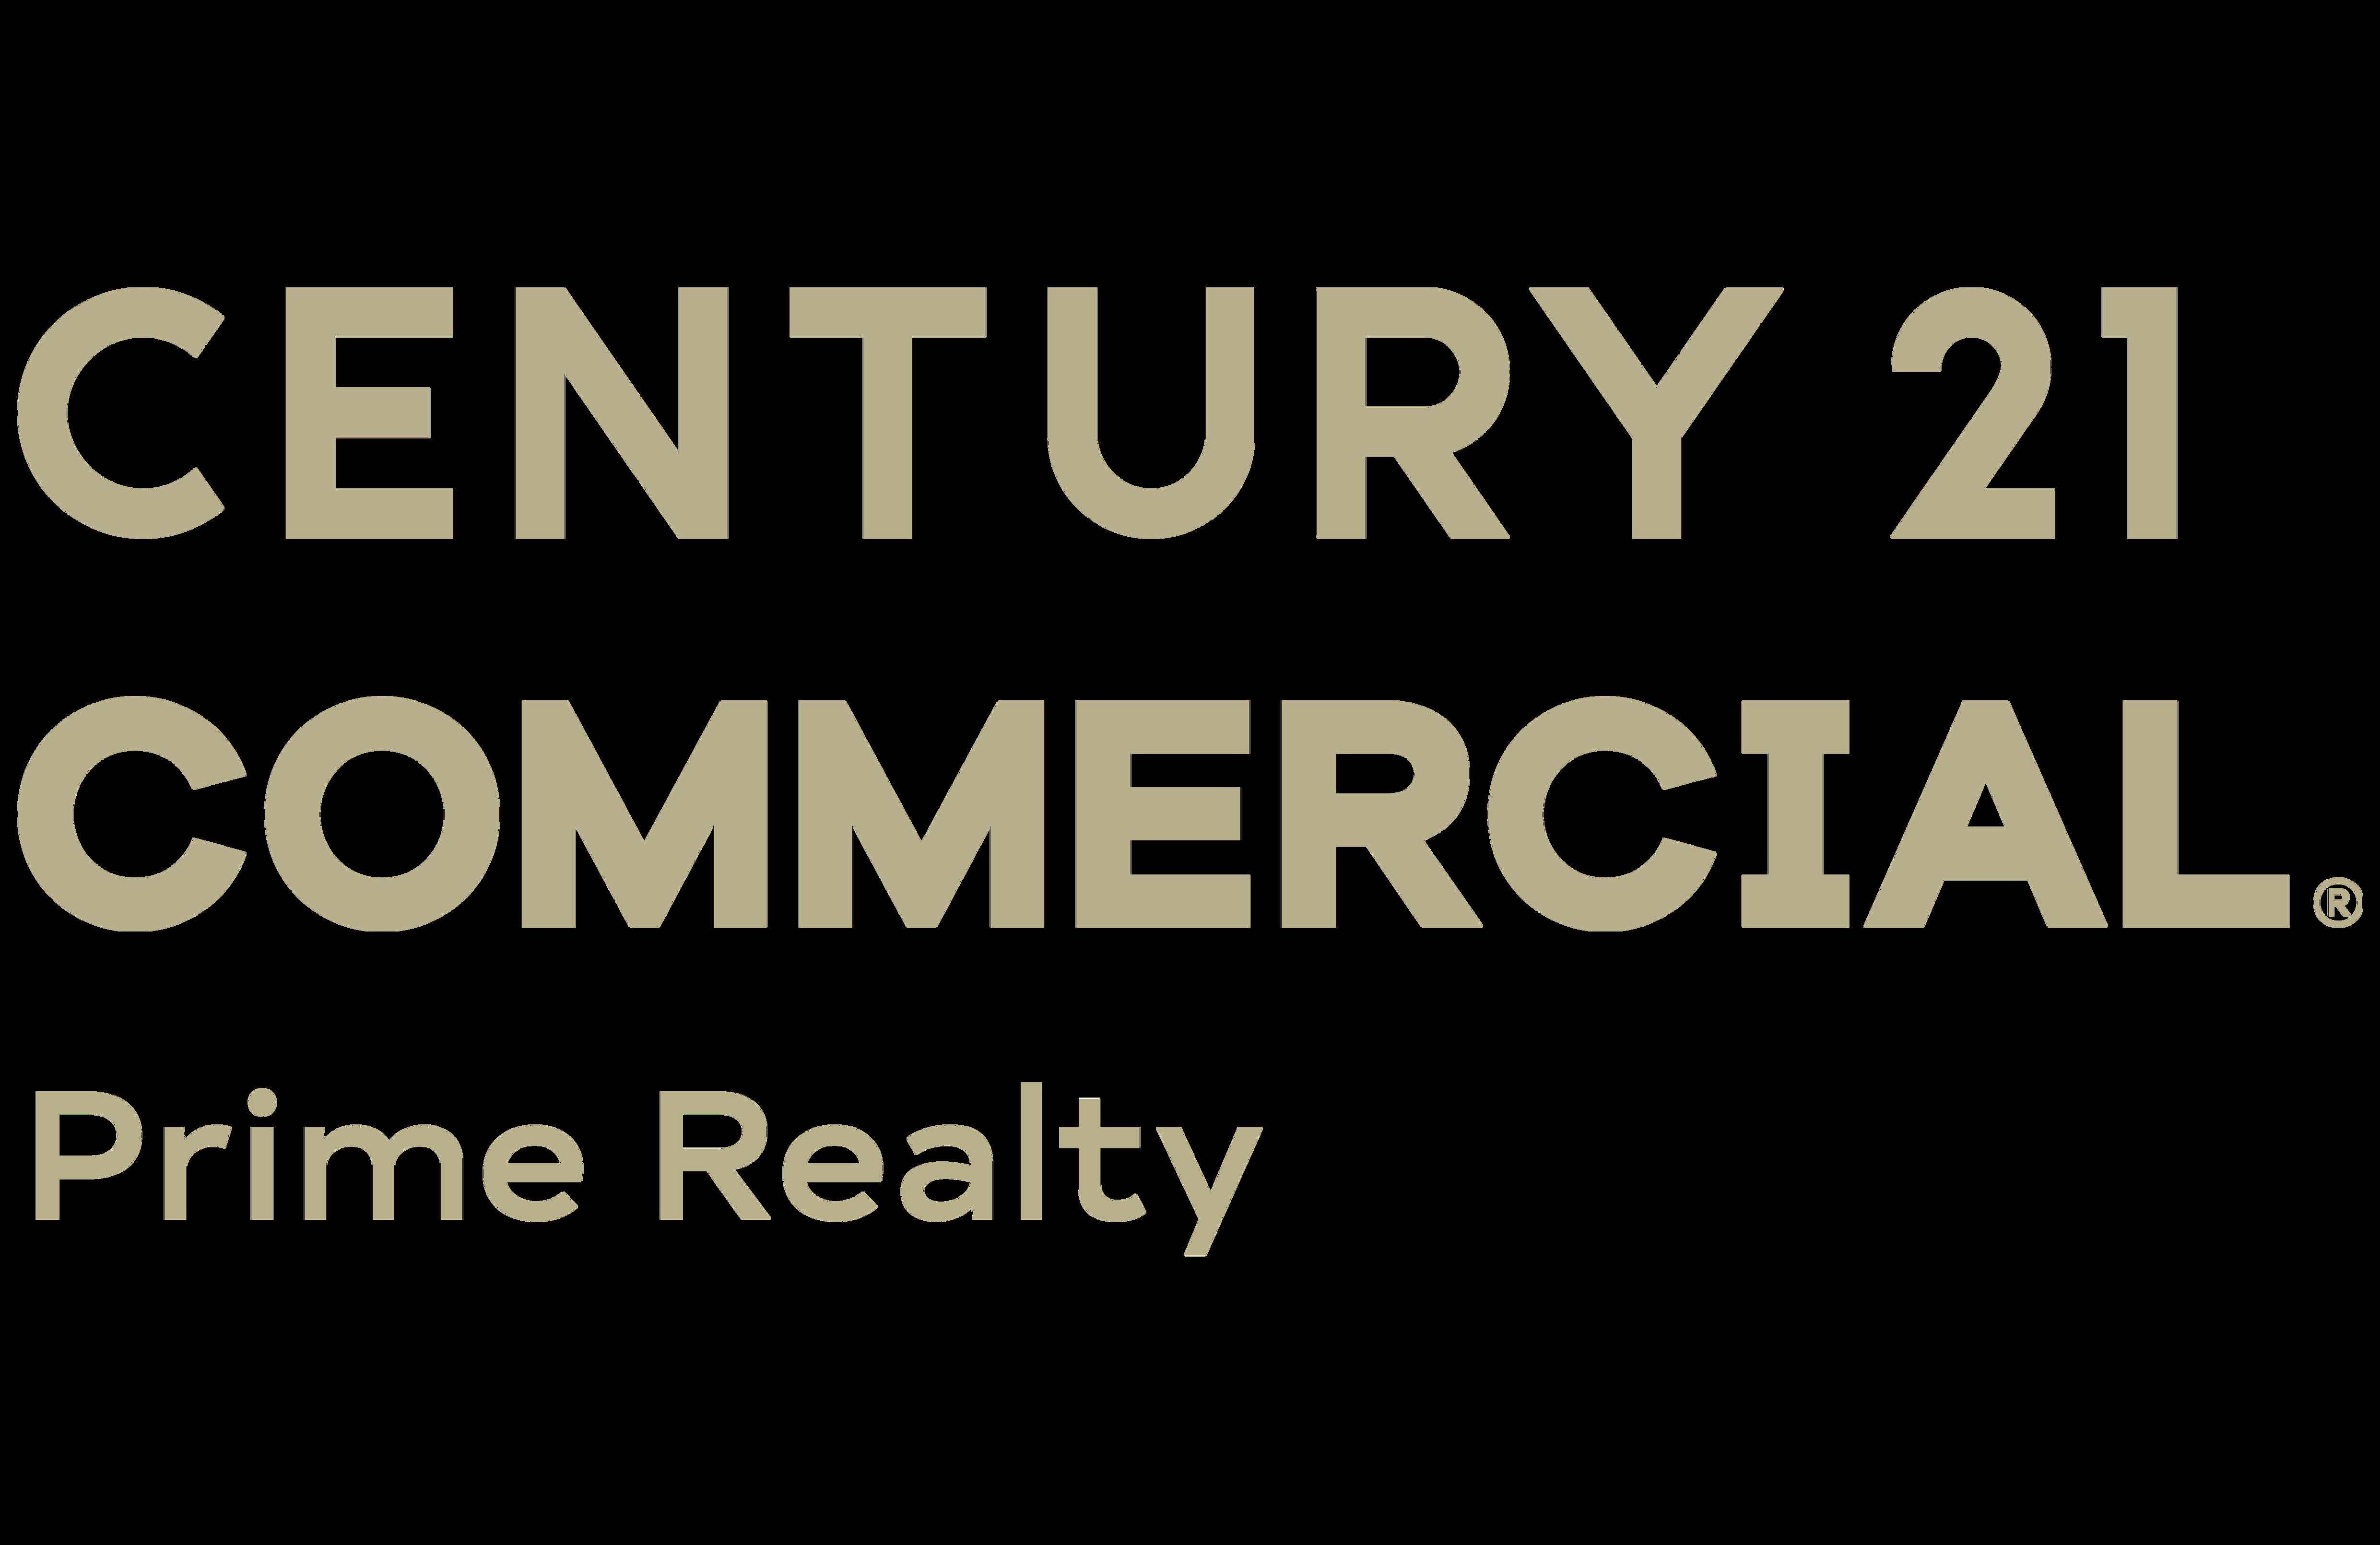 CENTURY 21 Prime Realty